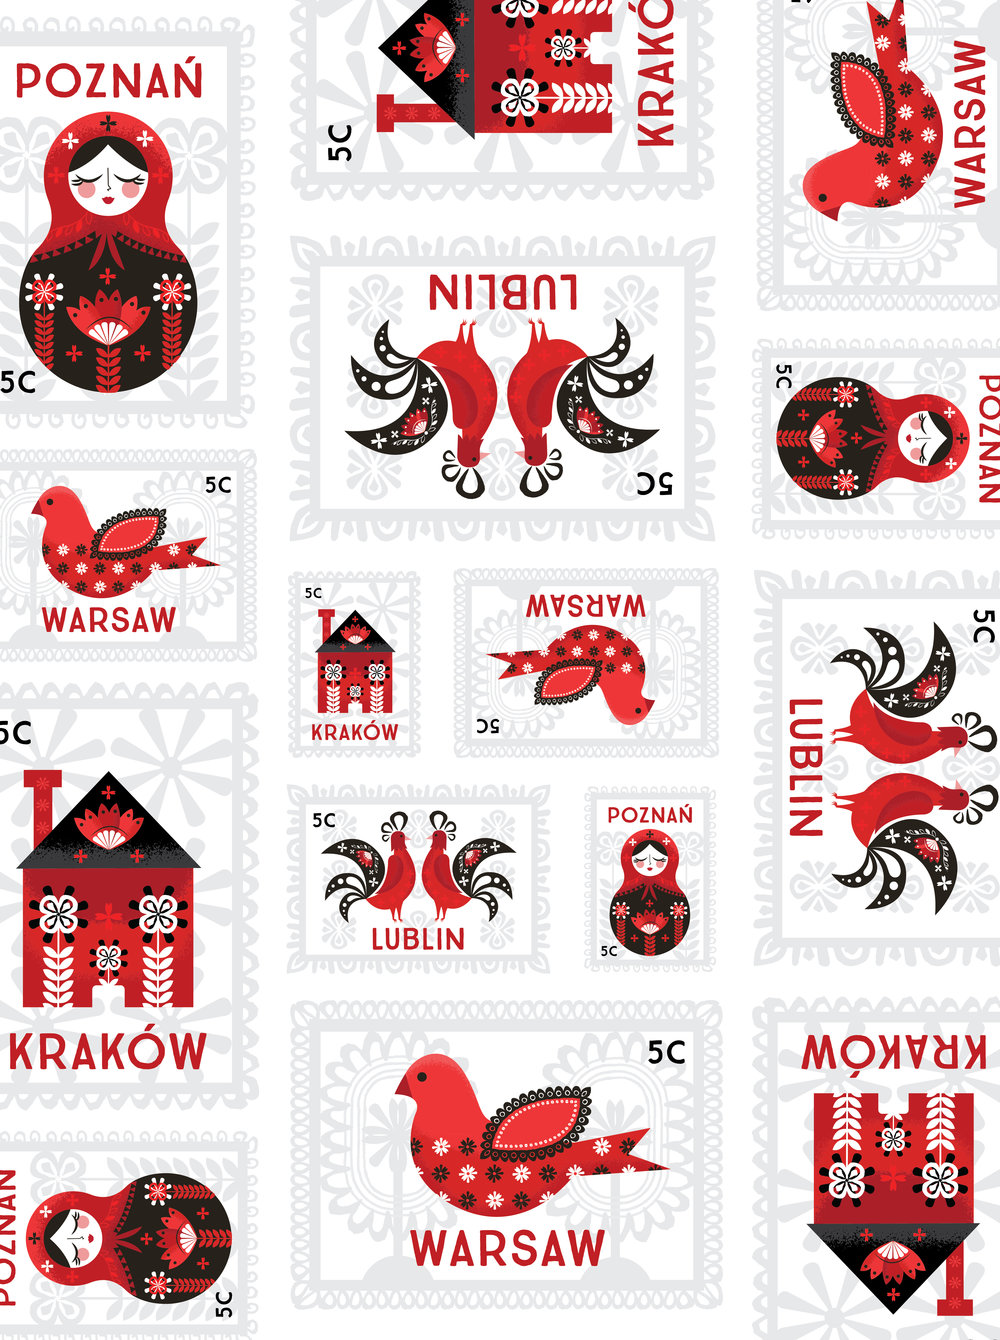 Stamp Pattern 2-01.jpg